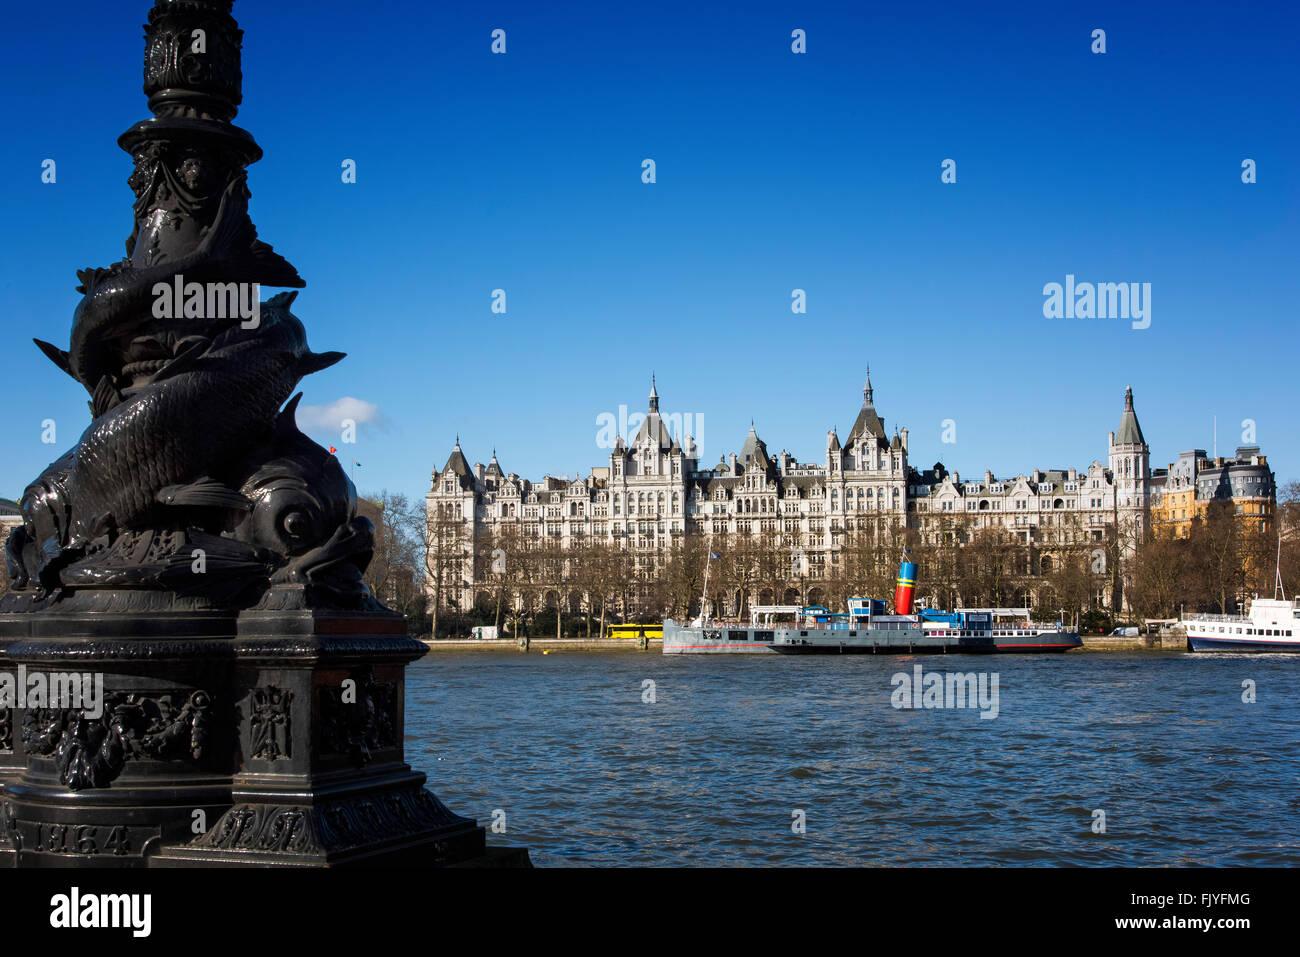 Whitehall Court Royal Horse guards Hotel Victoria embankment London England - Stock Image